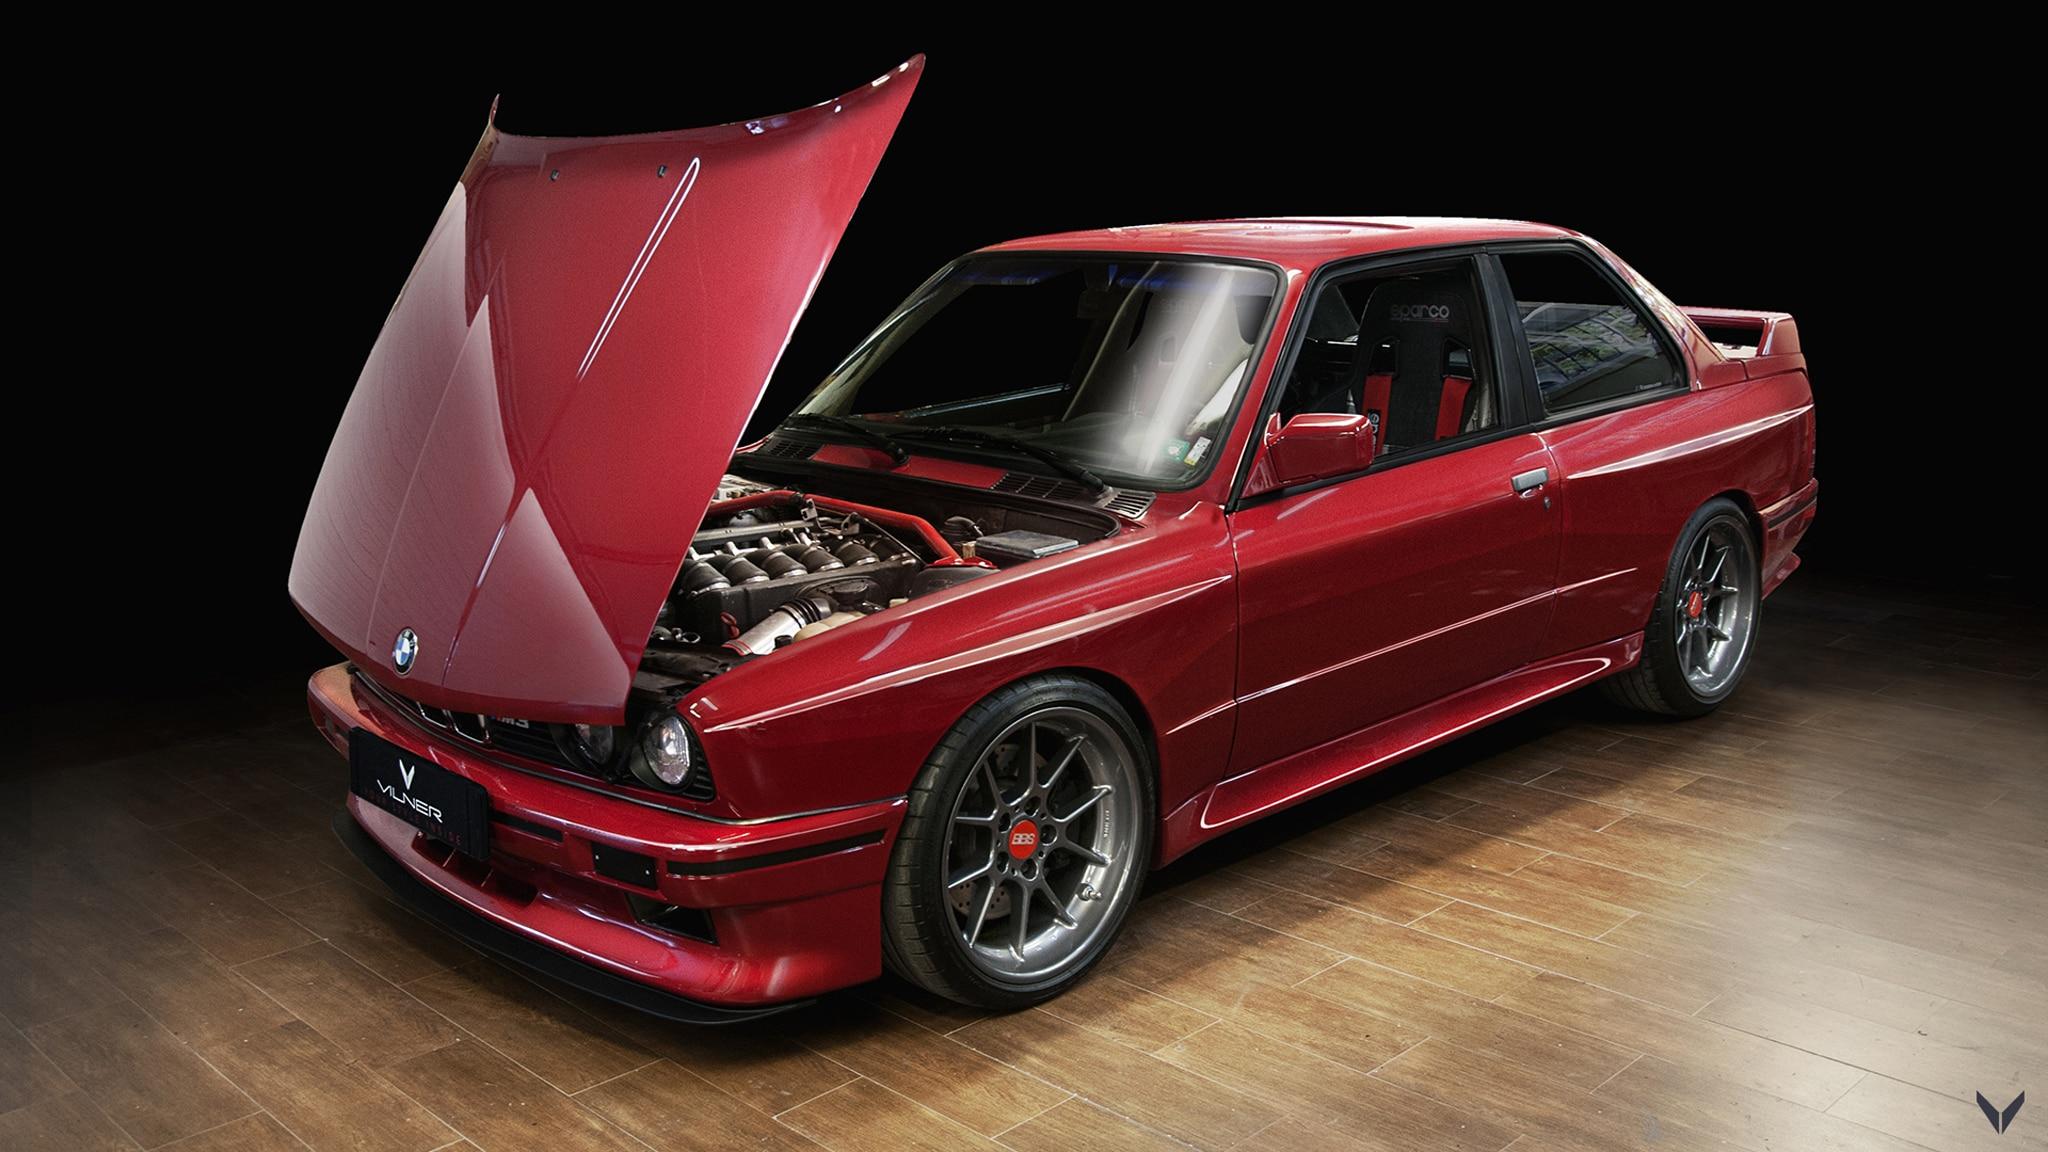 BMW_M3_E30_by_Vilner_Garage_1